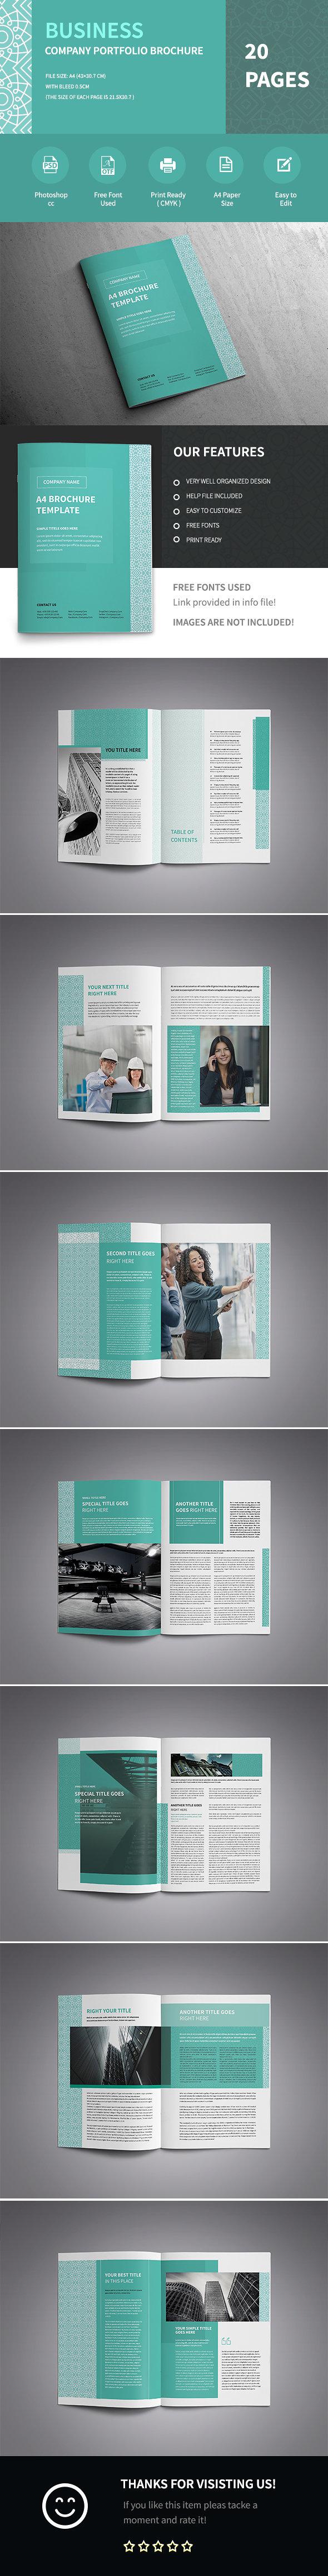 Modern A4 Corporate Business Brochure Template